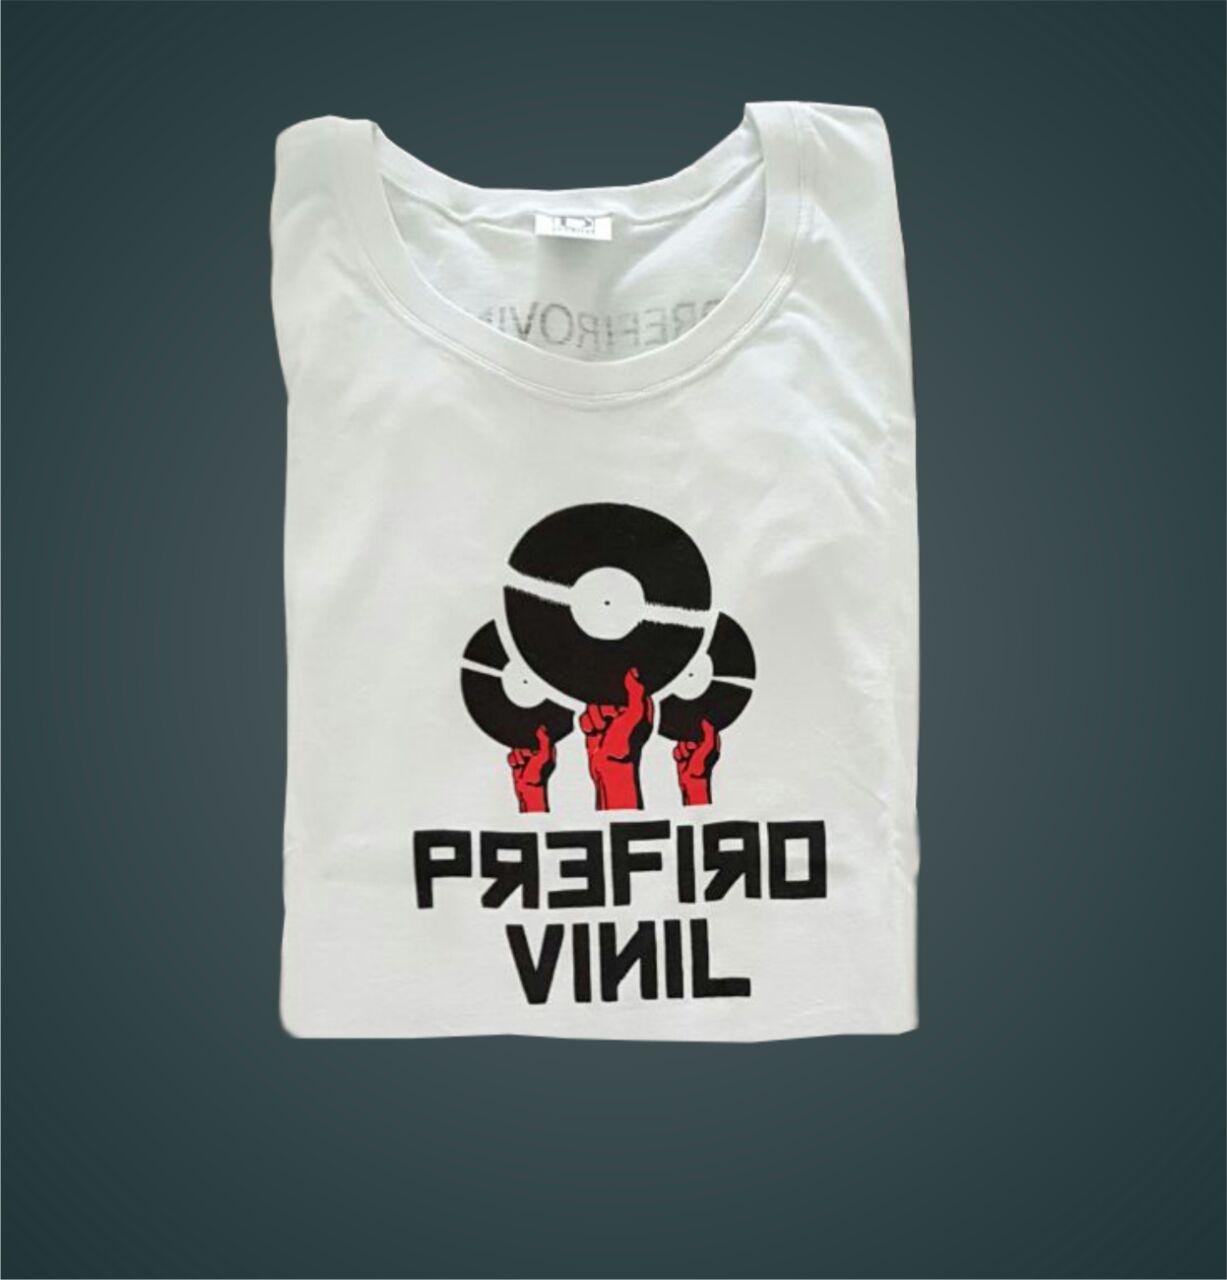 e161e5a2ce Prefiro Vinil  Tshirt - Branca - G - Camiseta Prefiro Vinil Branca Feminina